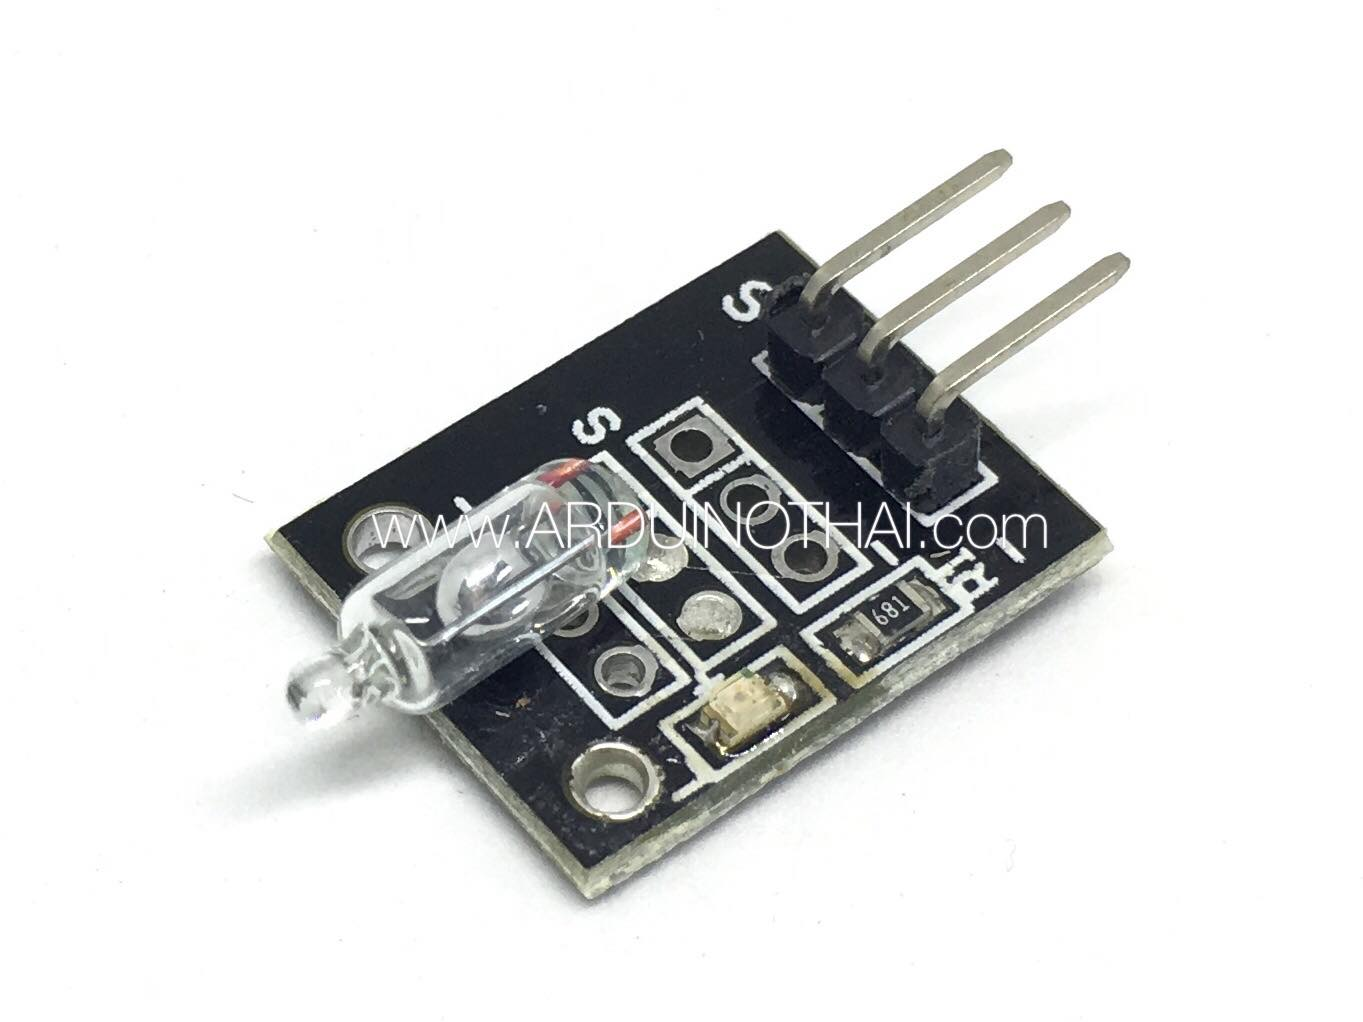 Mercury Tilt Switch Module (KY-017)